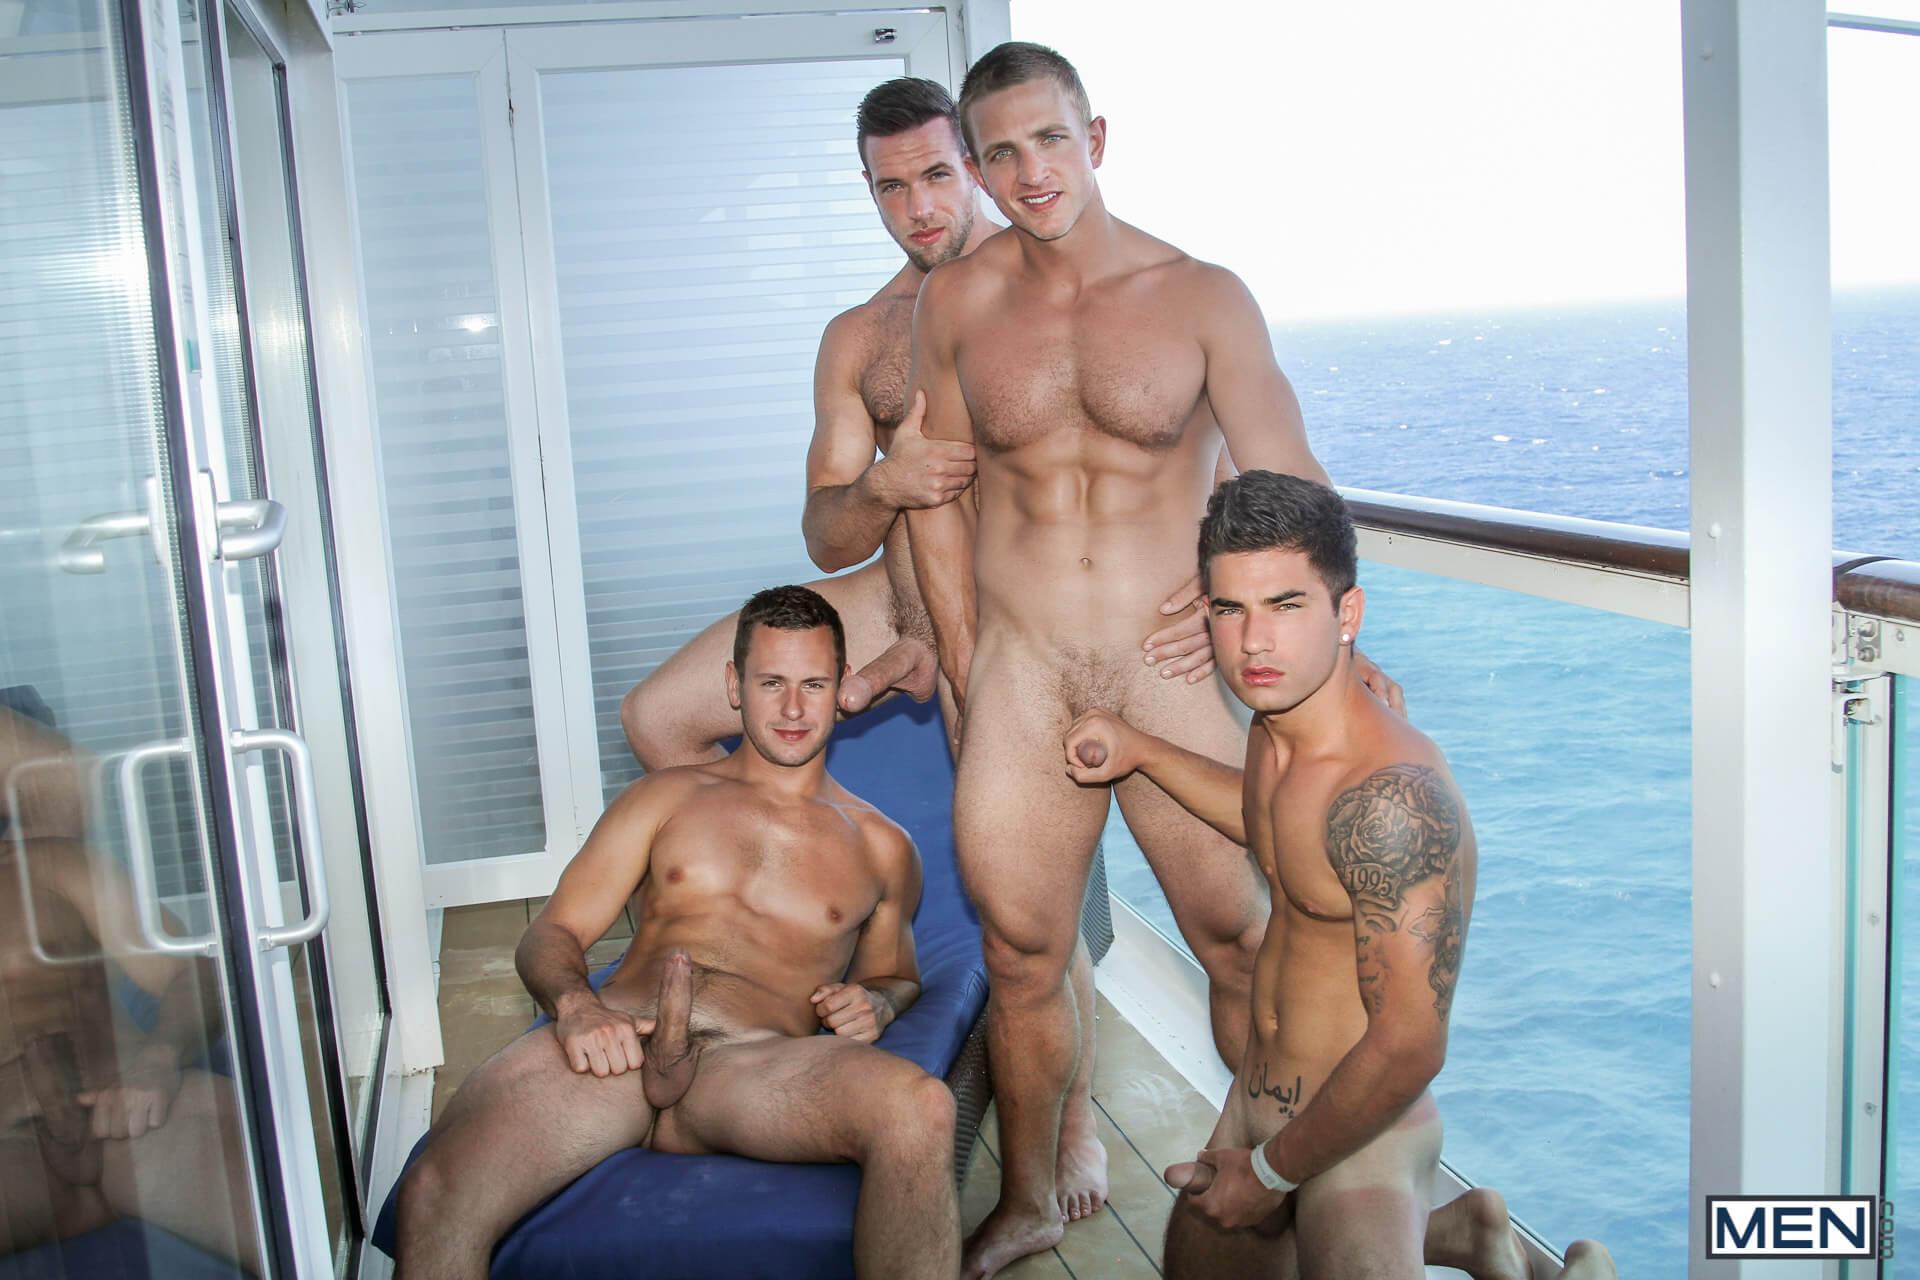 Men Jizz Orgy Men At Sea Part Alex Mecum Brenner Bolton Landon Mycles Vadim Black Gay Porn Blog Image